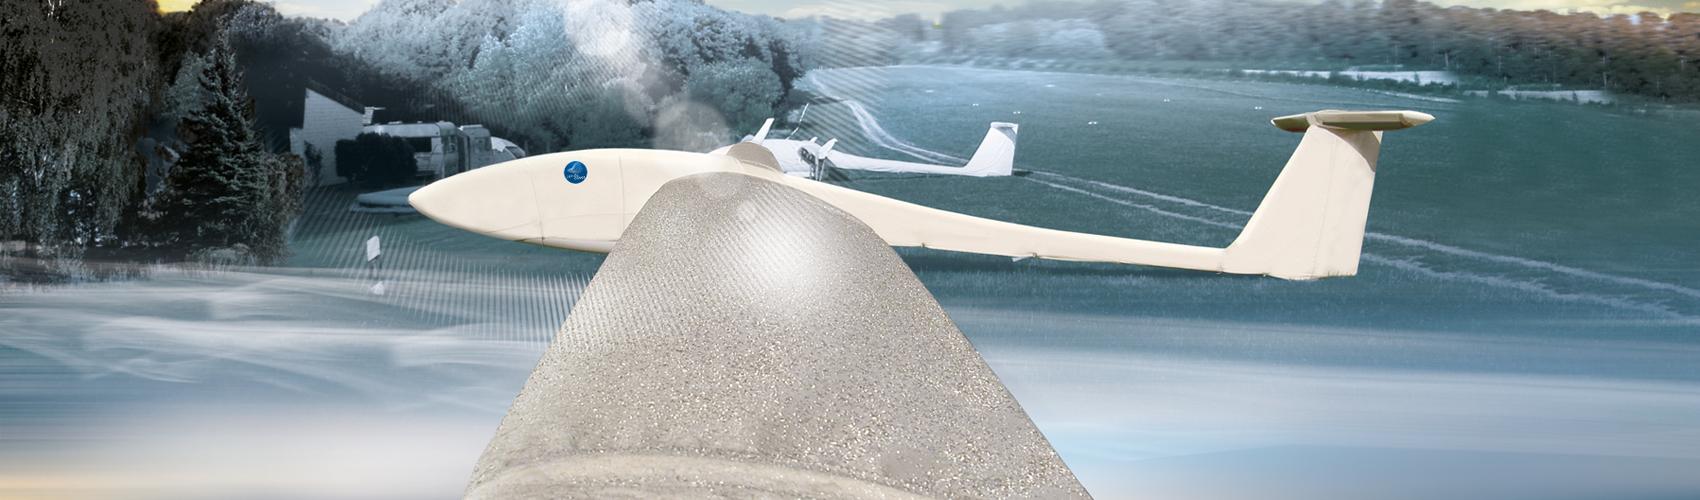 Jaxida Cover - Airplane - Segelflugzeug